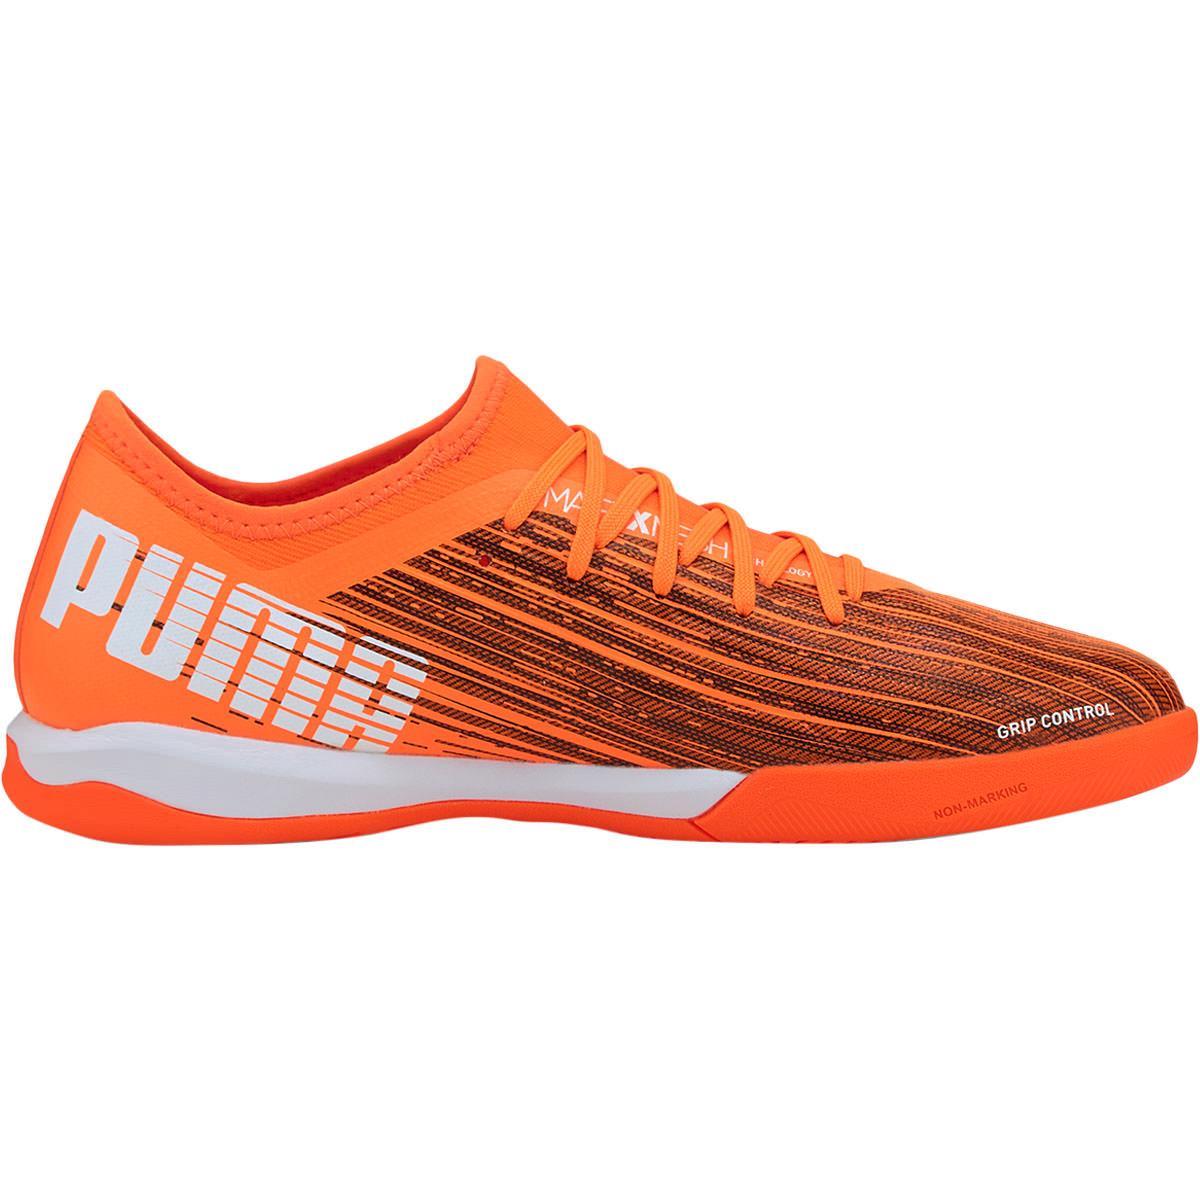 Puma Ultra 3.1 Håndboldsko Herre